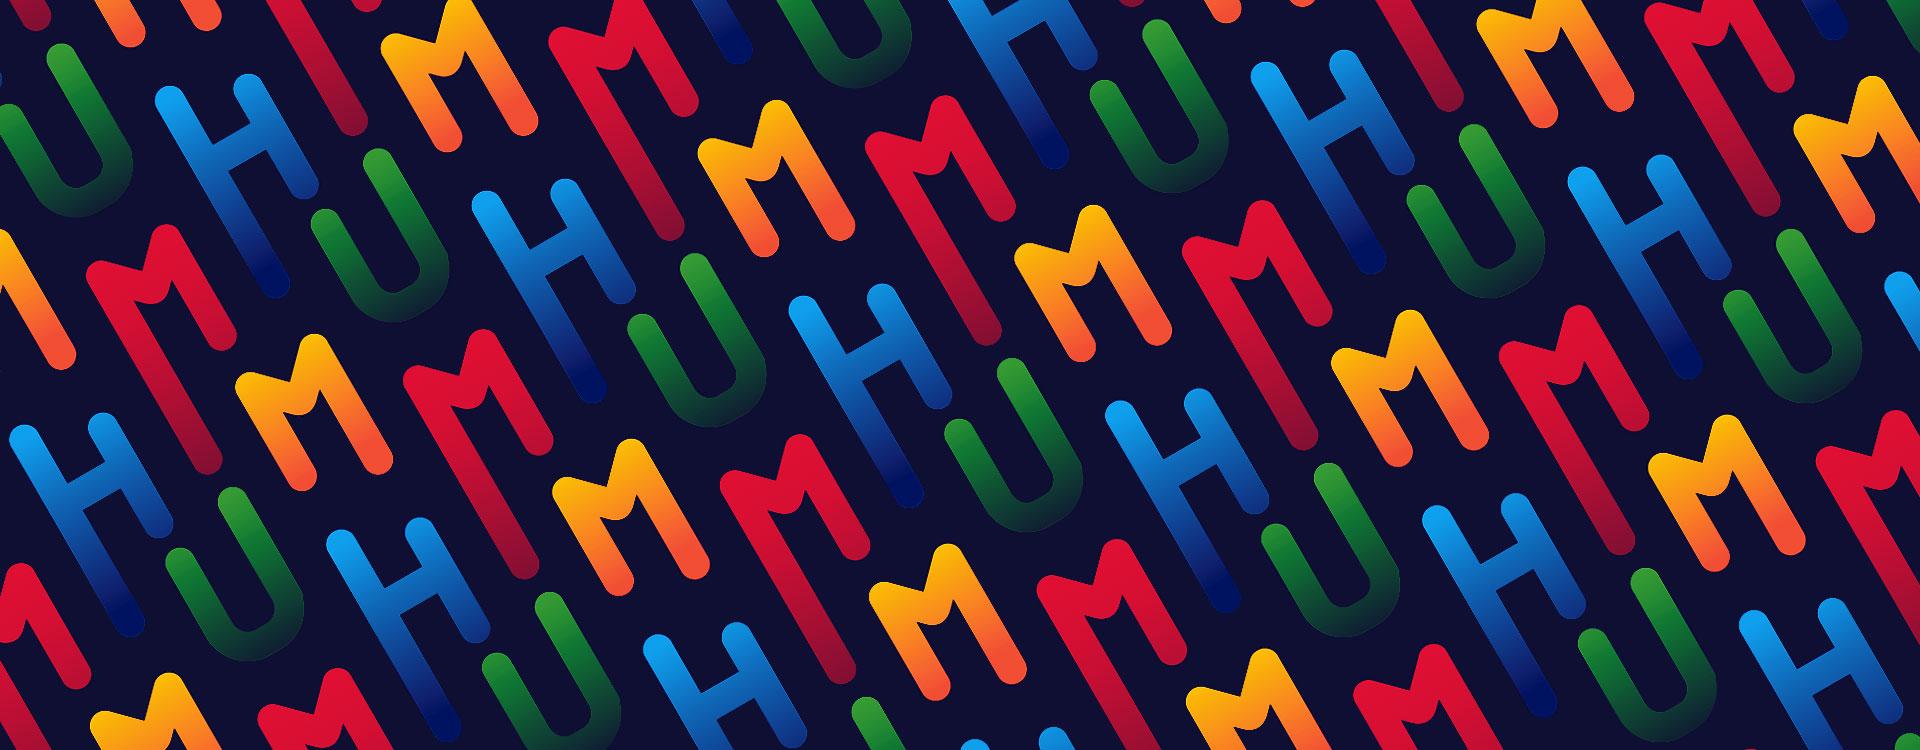 humm fm branding pattern design